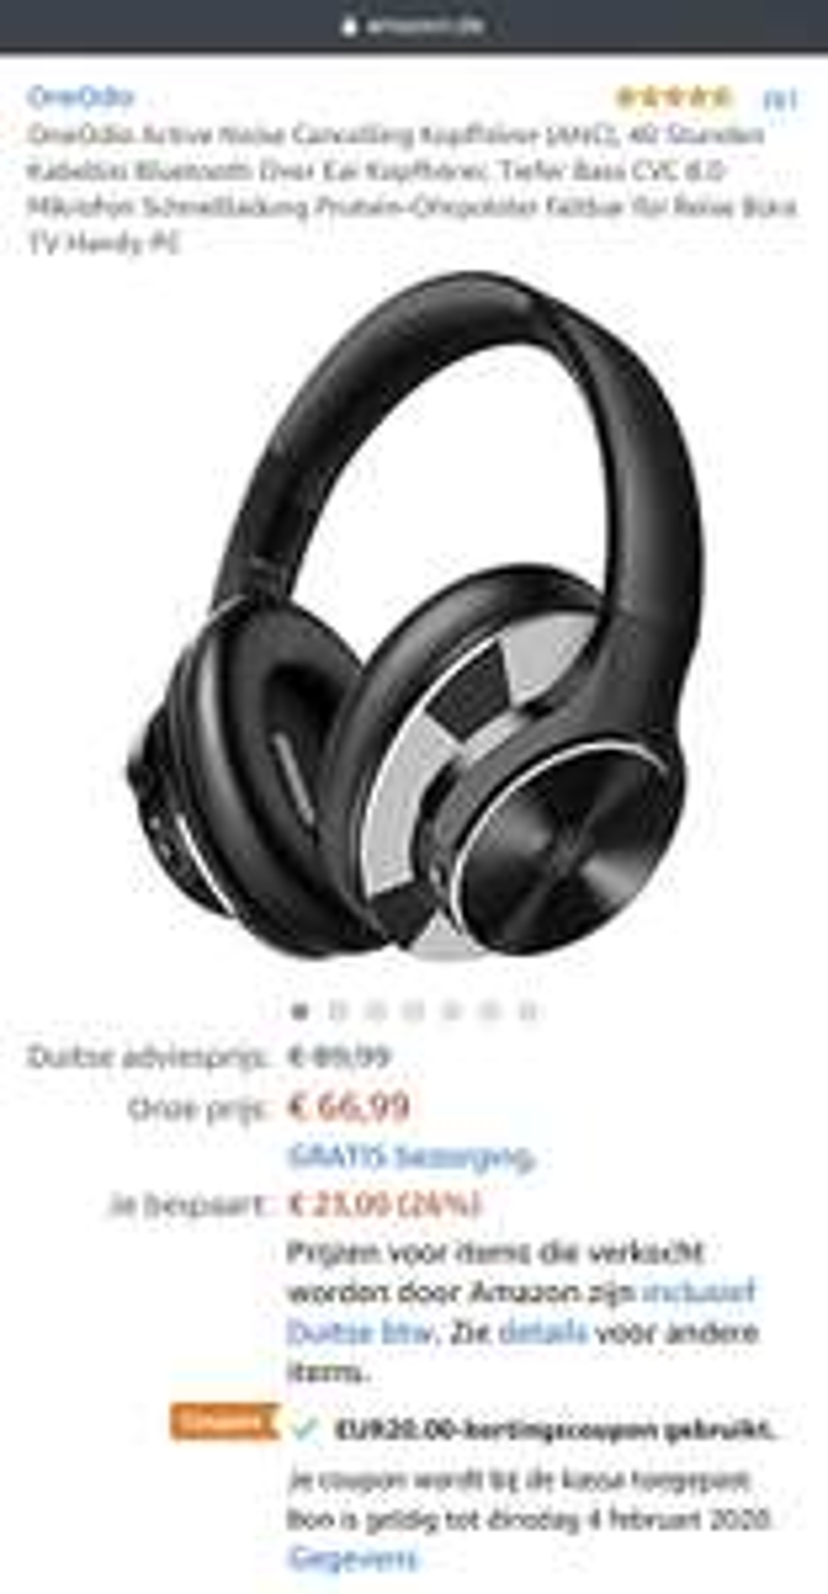 OneOdio A10-BK-EU incl Noise Canceling